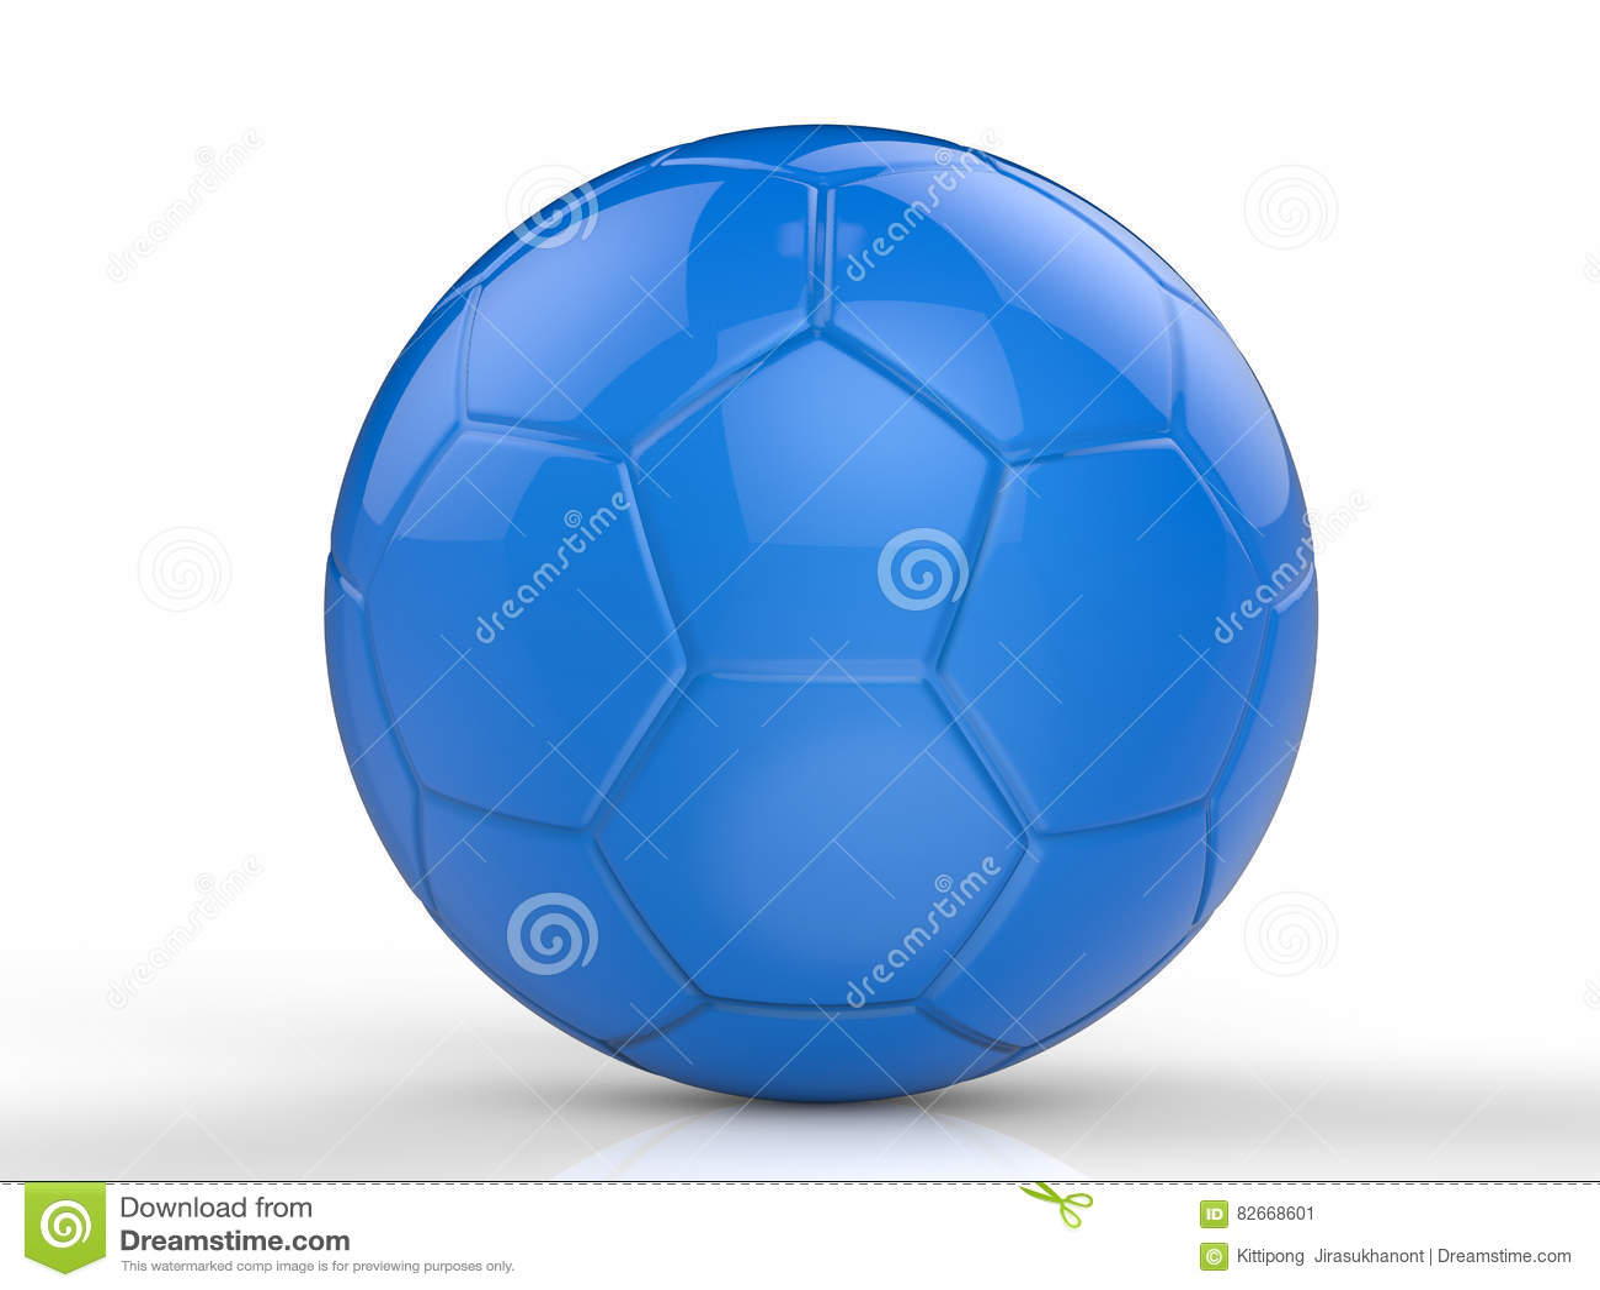 1efa95e454e8d Ballon de football bleu illustration stock. Illustration du sport ...